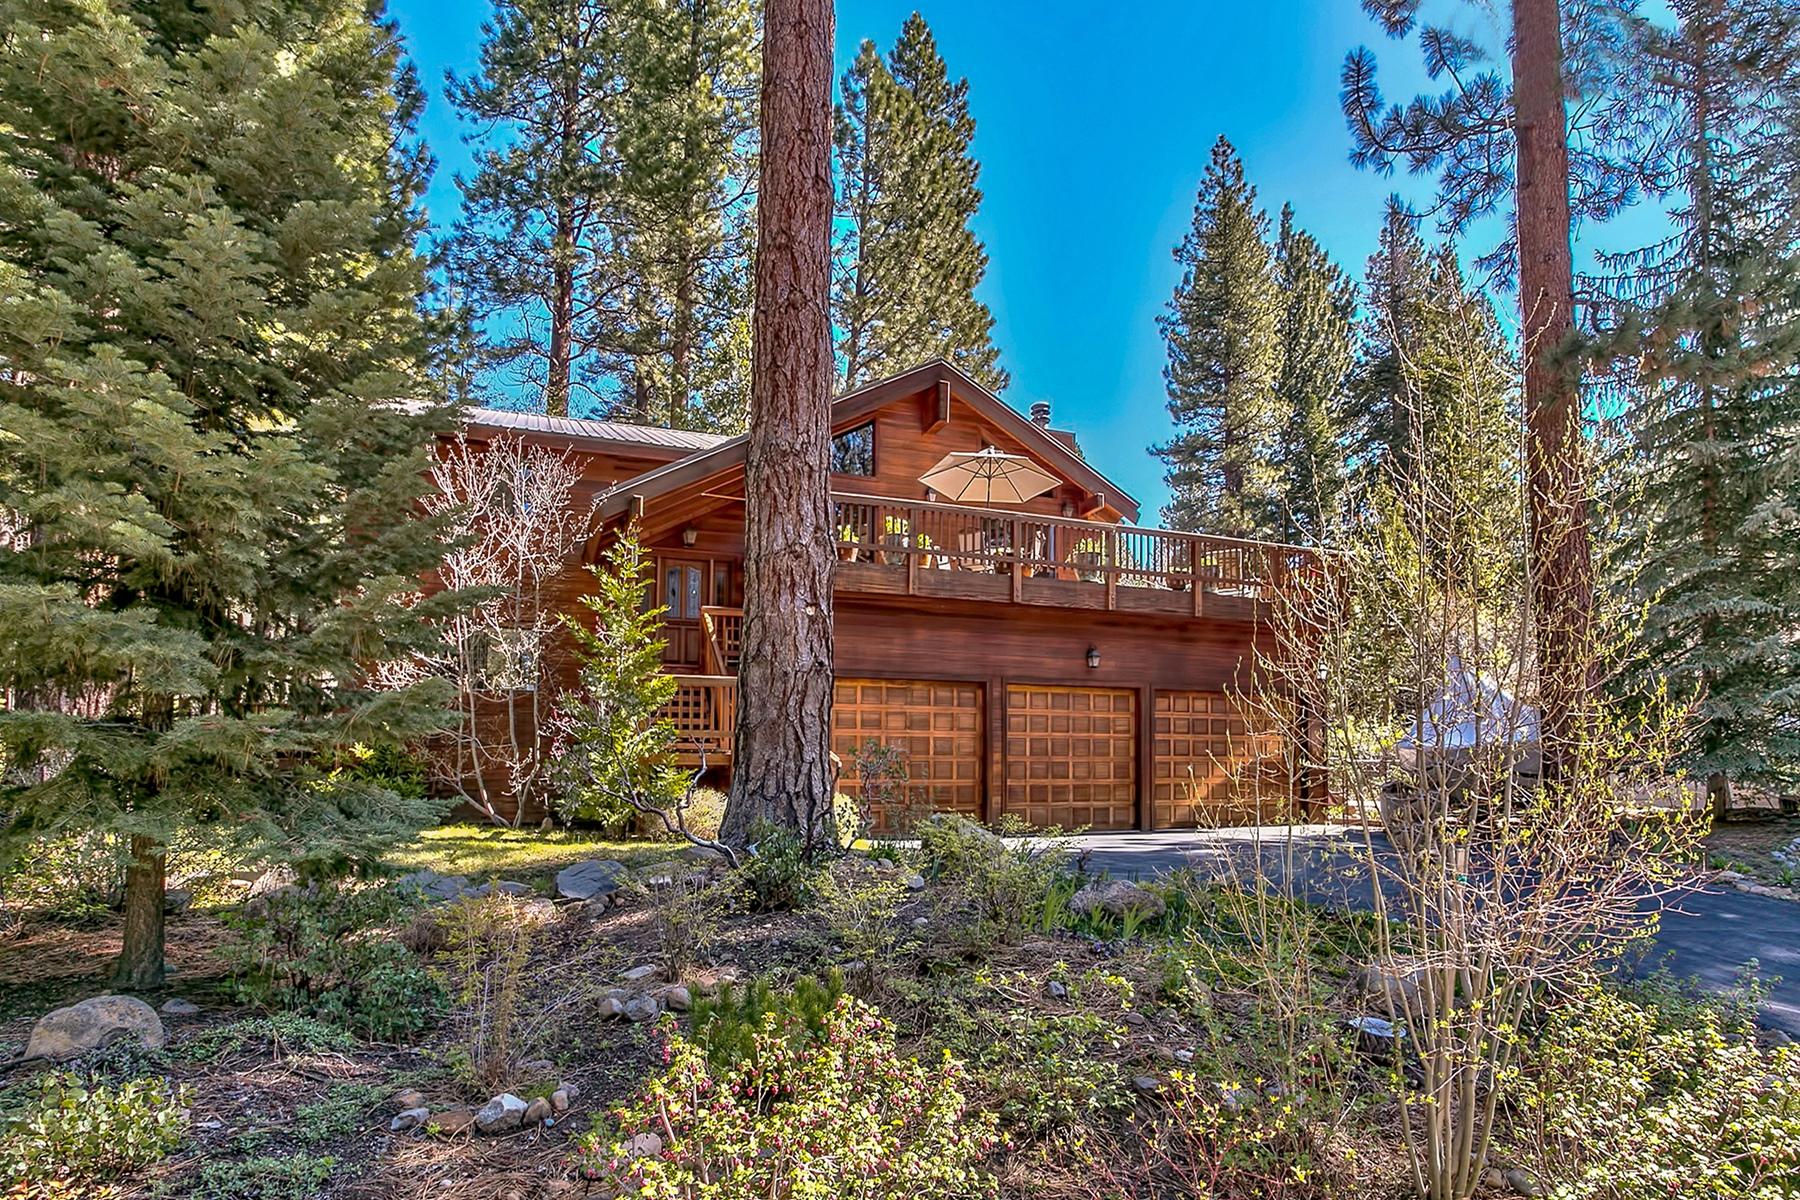 独户住宅 为 销售 在 842 Ophir Peak Road Incline Village, 内华达州, 89451 Lake Tahoe, 美国